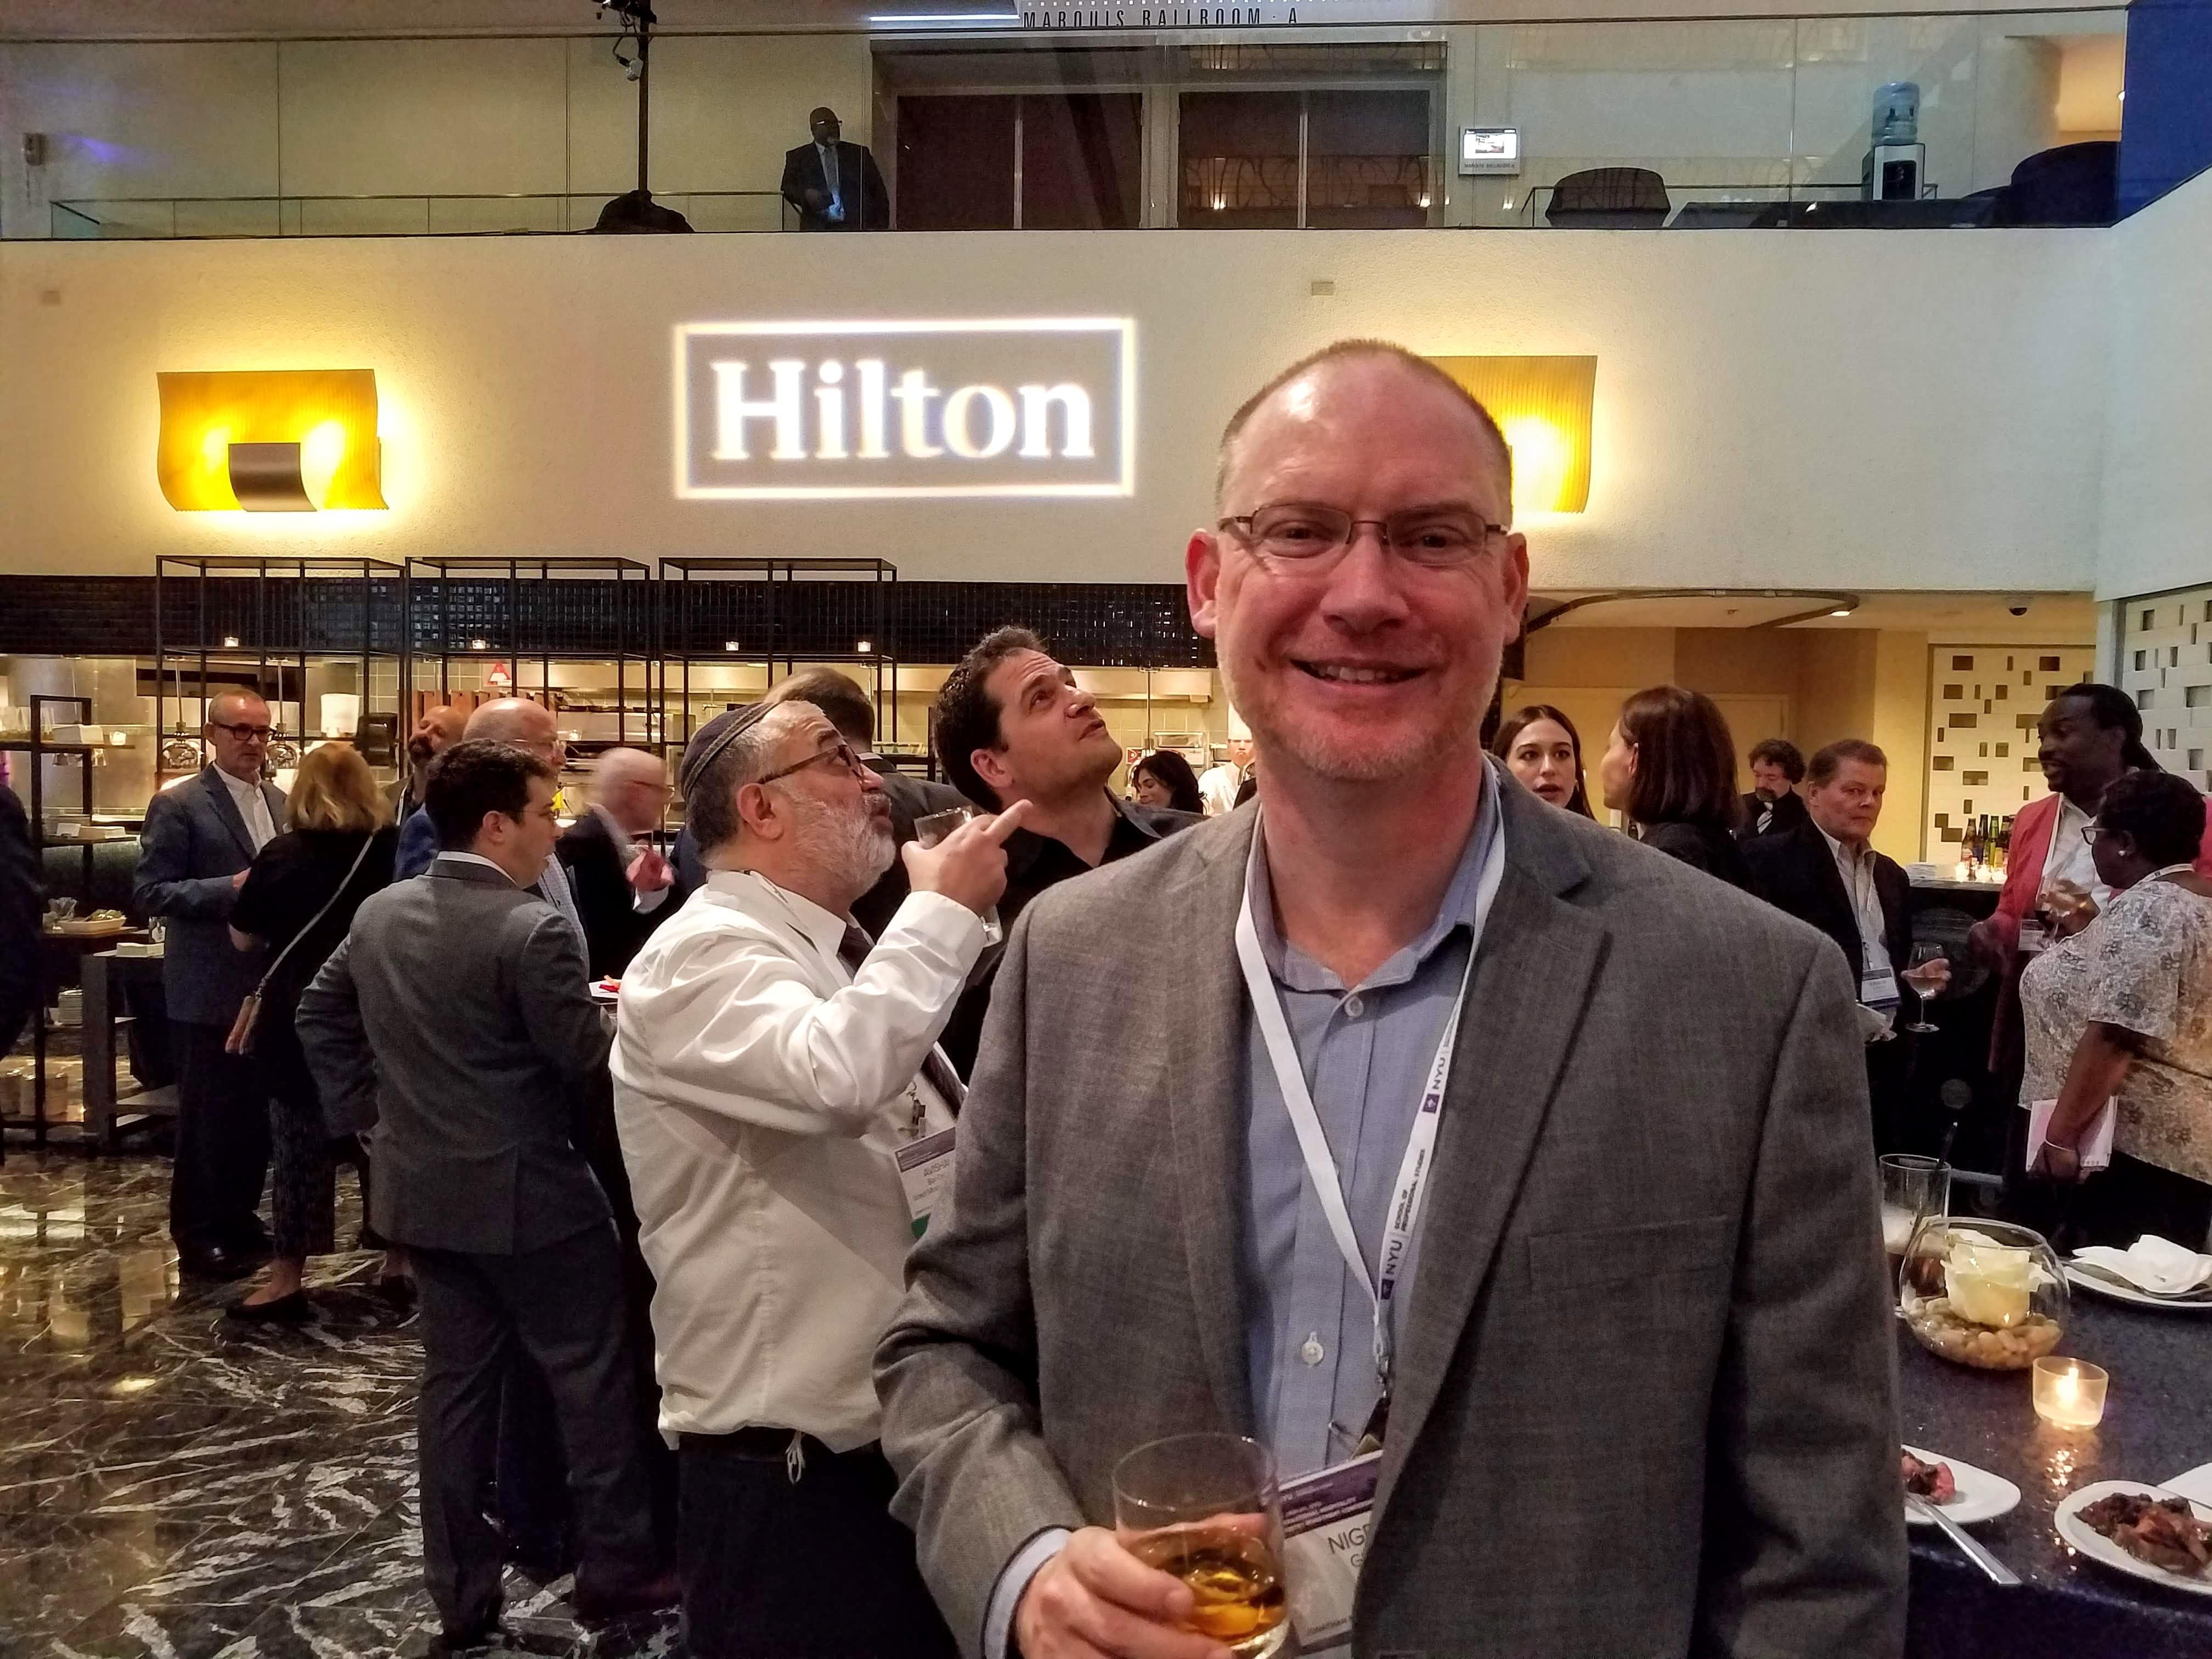 Nigel Glennie, VP of corporate communications for Hilton